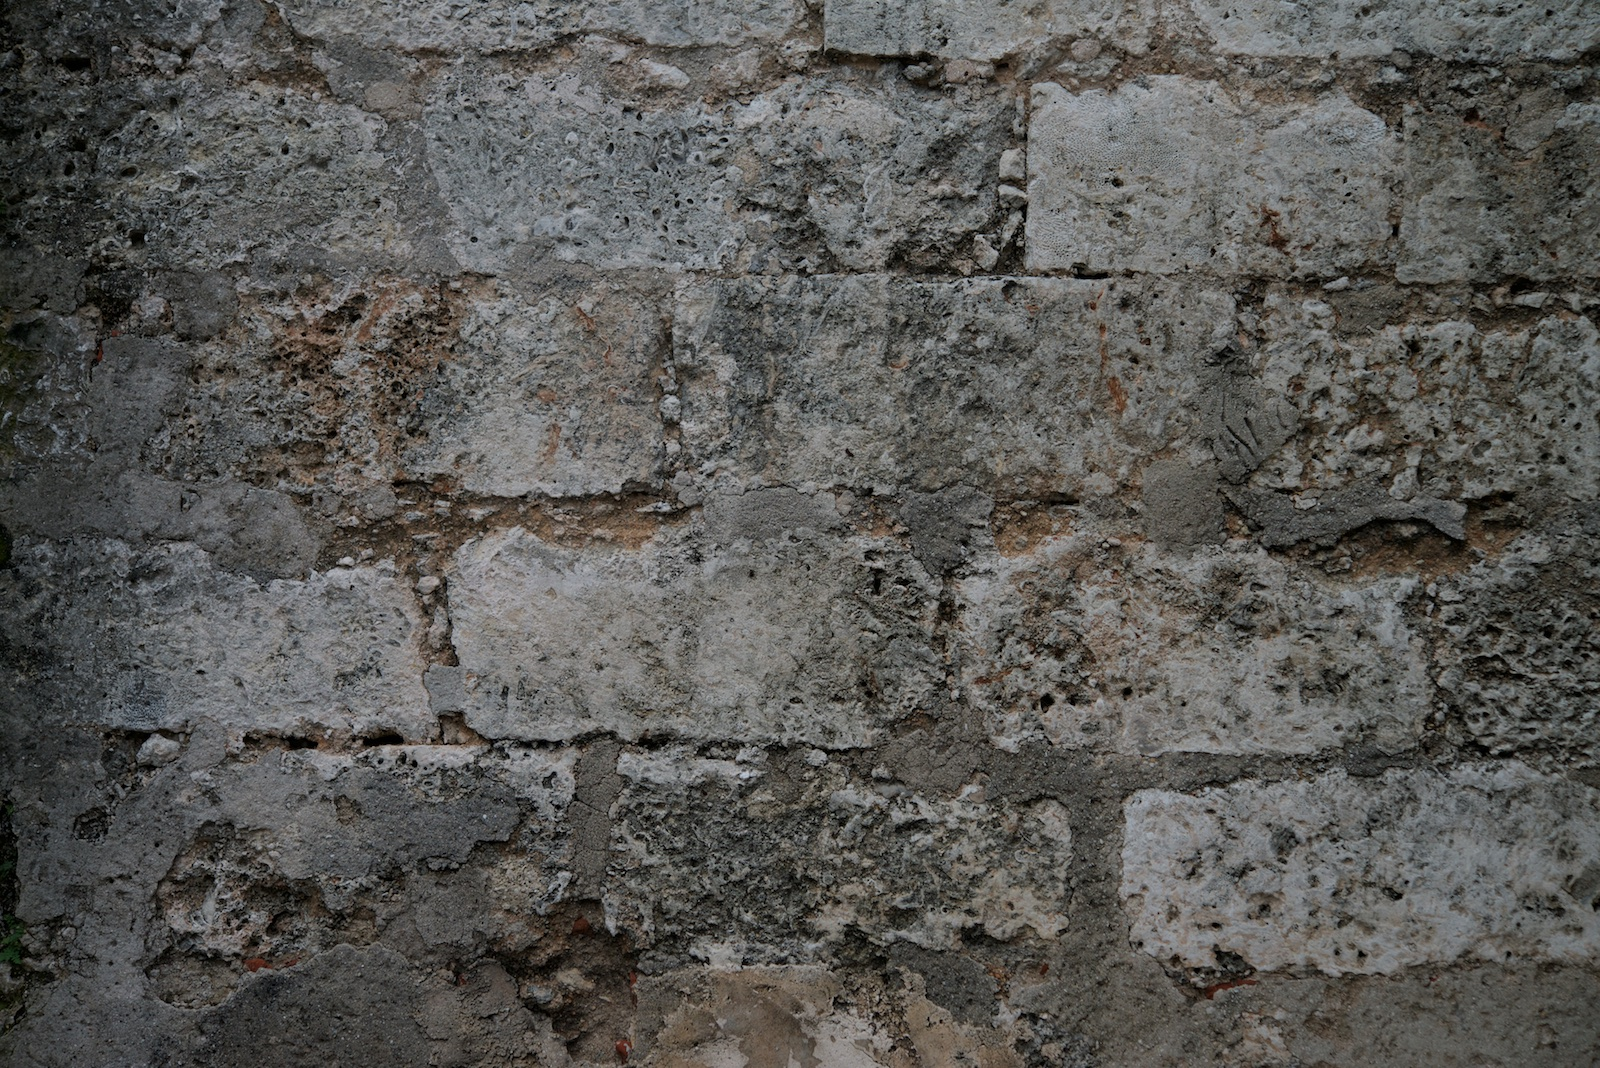 2016-0010-0131. Stone wall, La Habana, Cuba.